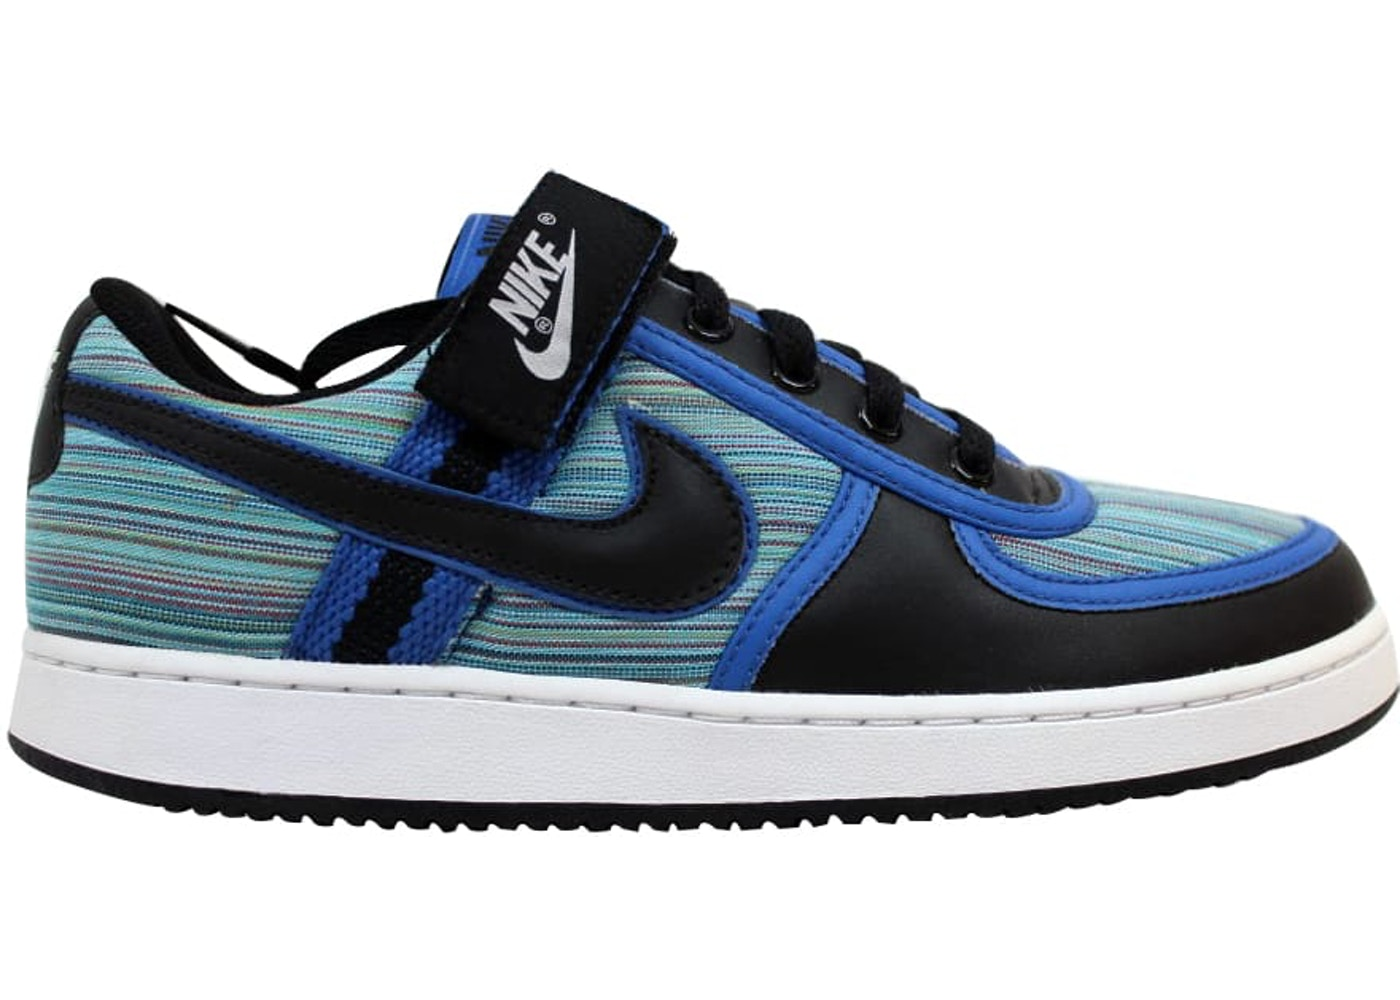 Fangoso adoptar Salida  Nike Vandal Low Black/Black-Varsity Royal-Rainbow - 316432-001